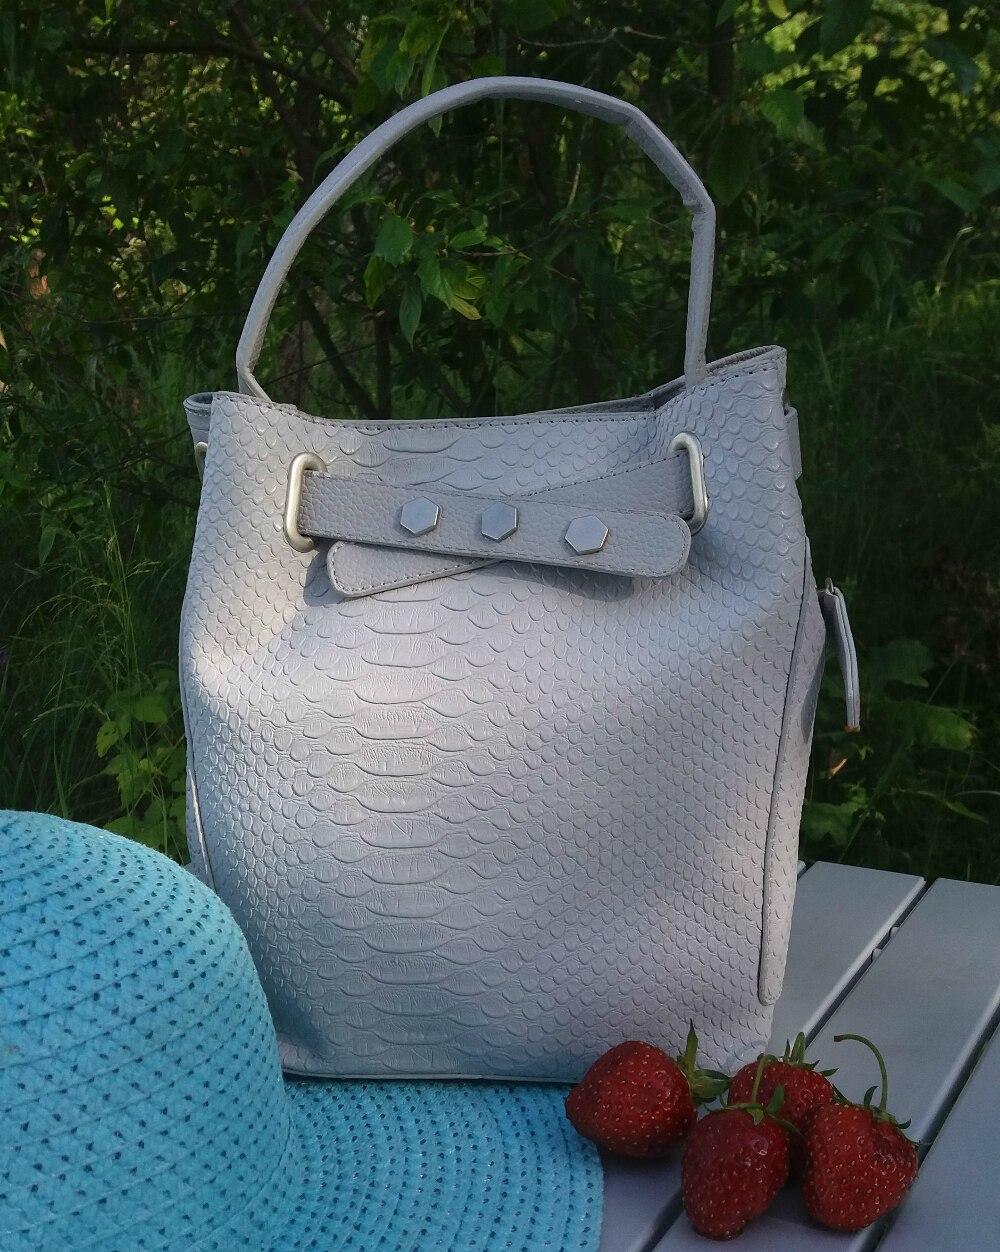 New 2016 Summer Fashion Women Messenger Bags Serpentine Unique Bucket Bags Casual Sac A Main Femme De Marque For Party Shopping